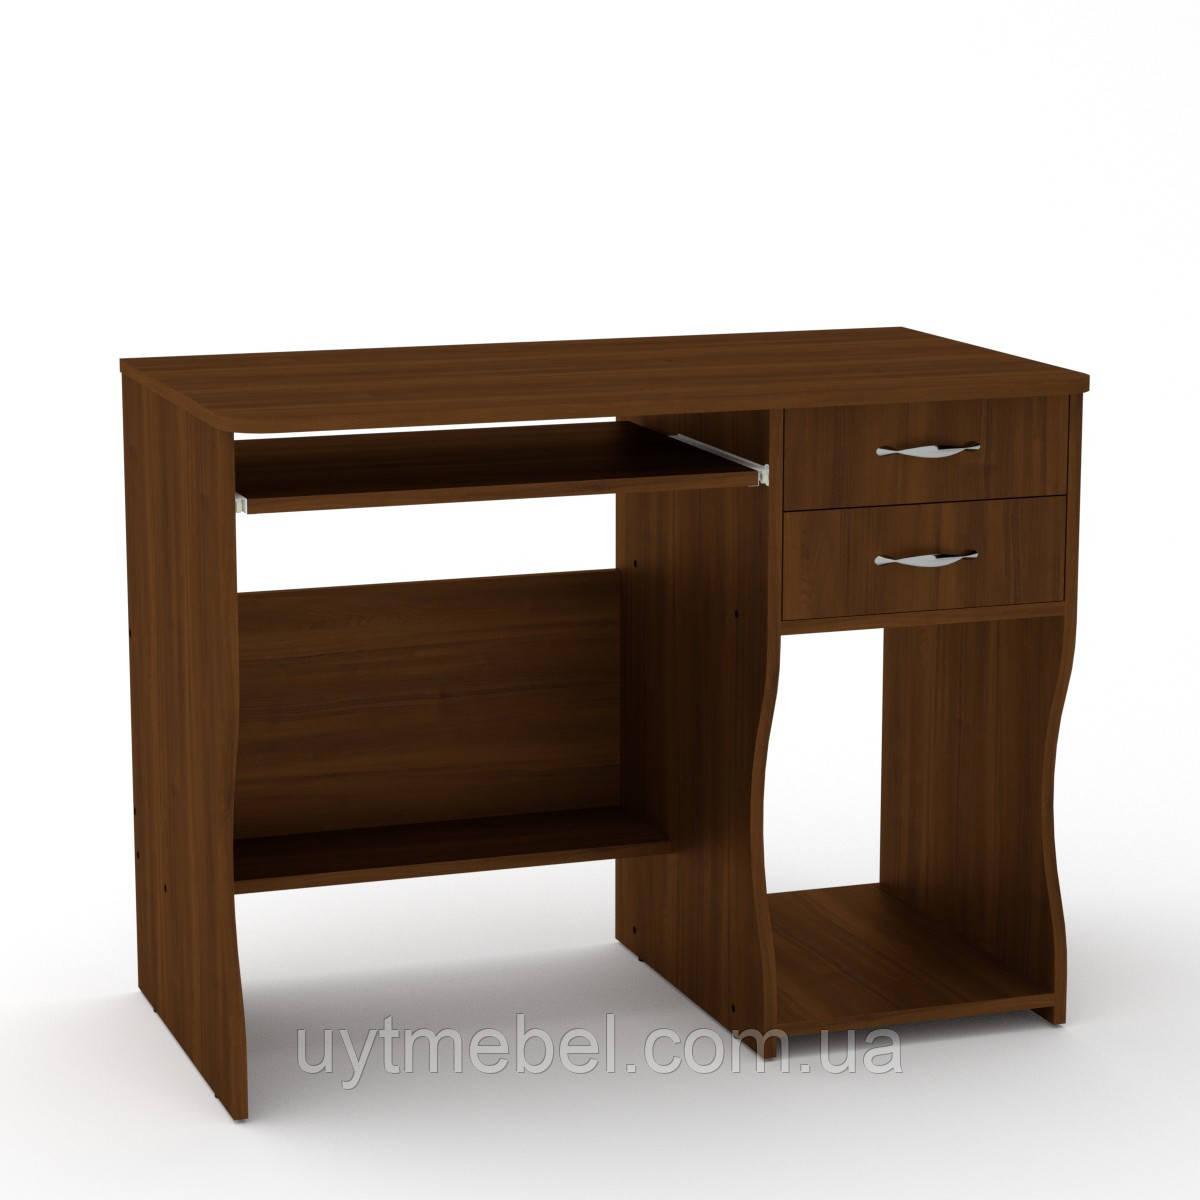 Стол компьют. СКМ-7 орех (КОМПАНИТ)